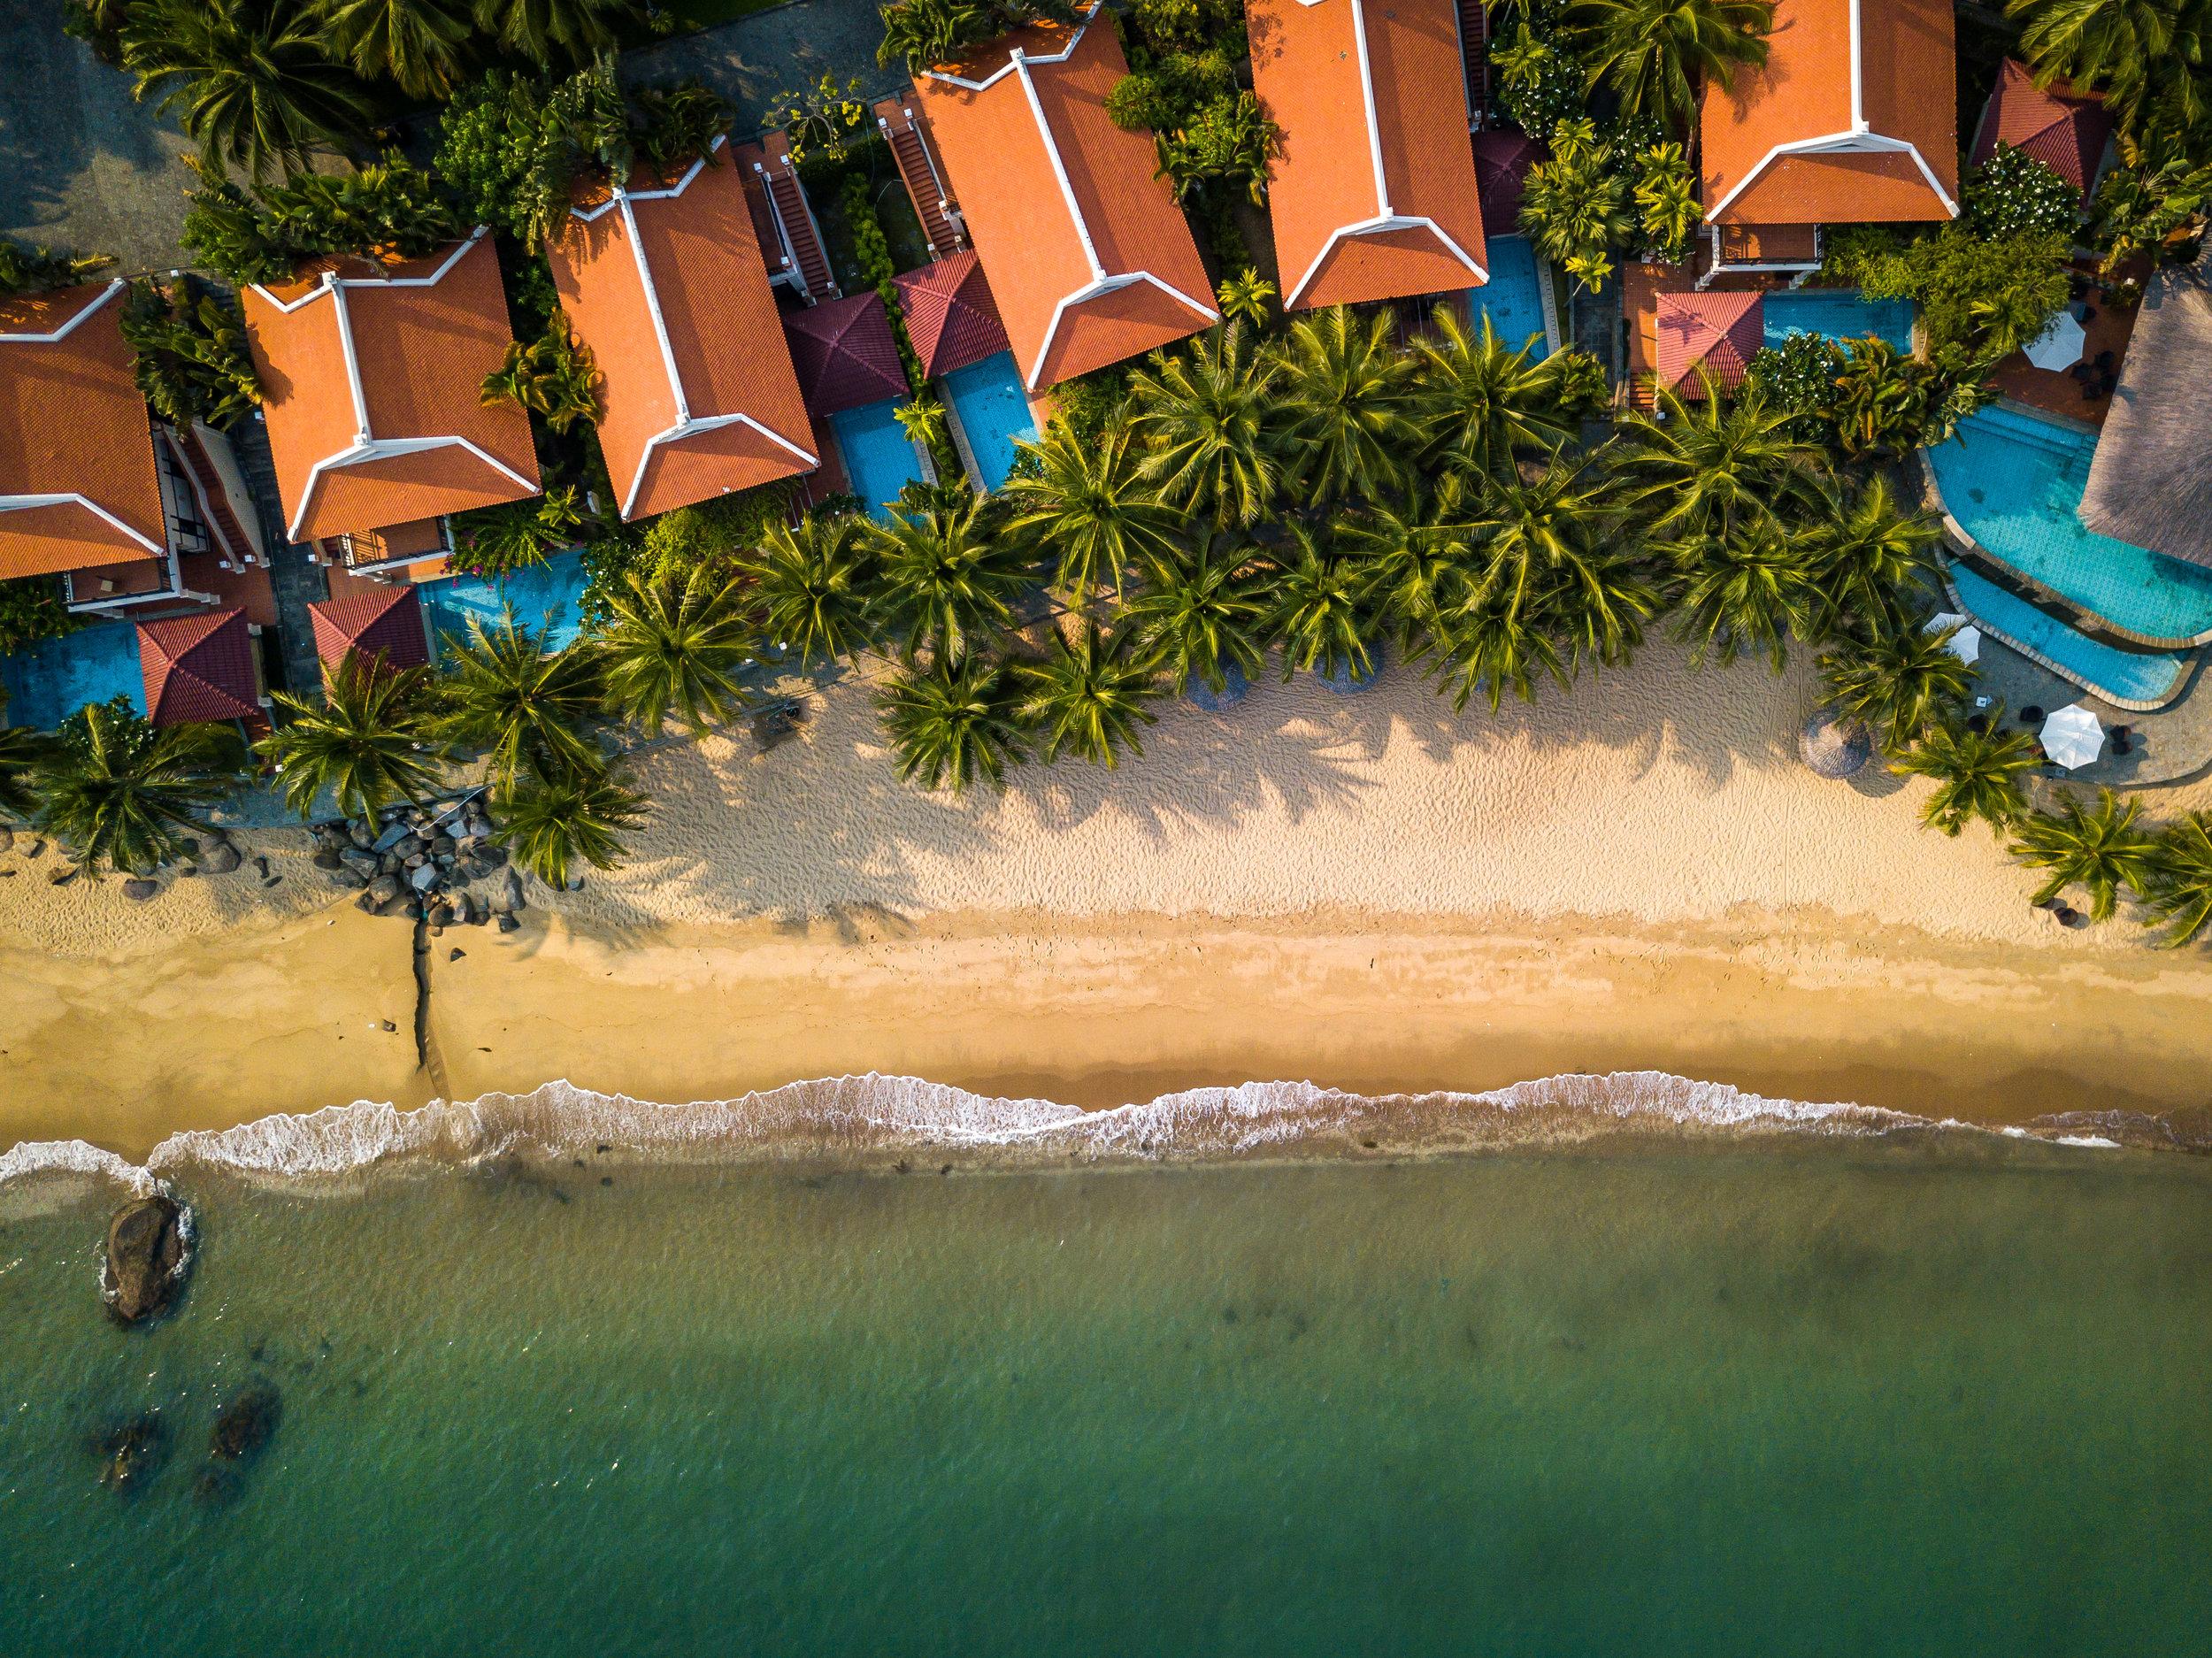 Coconut beach - Da Nang, Vietnam